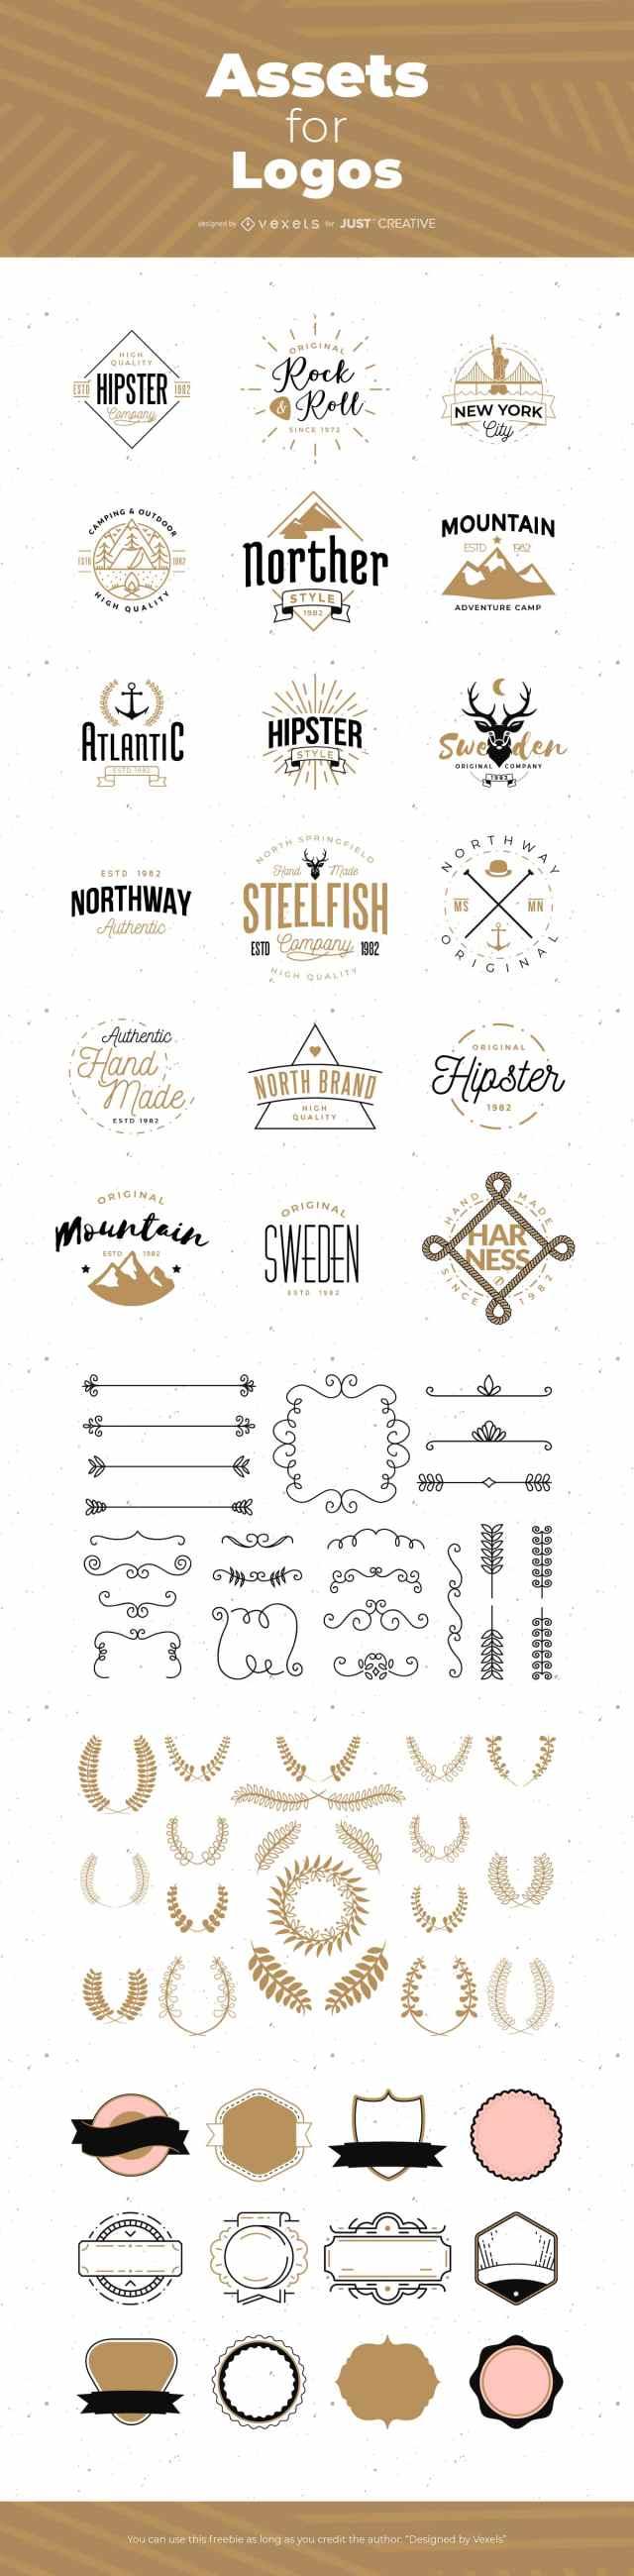 logo design services chennai